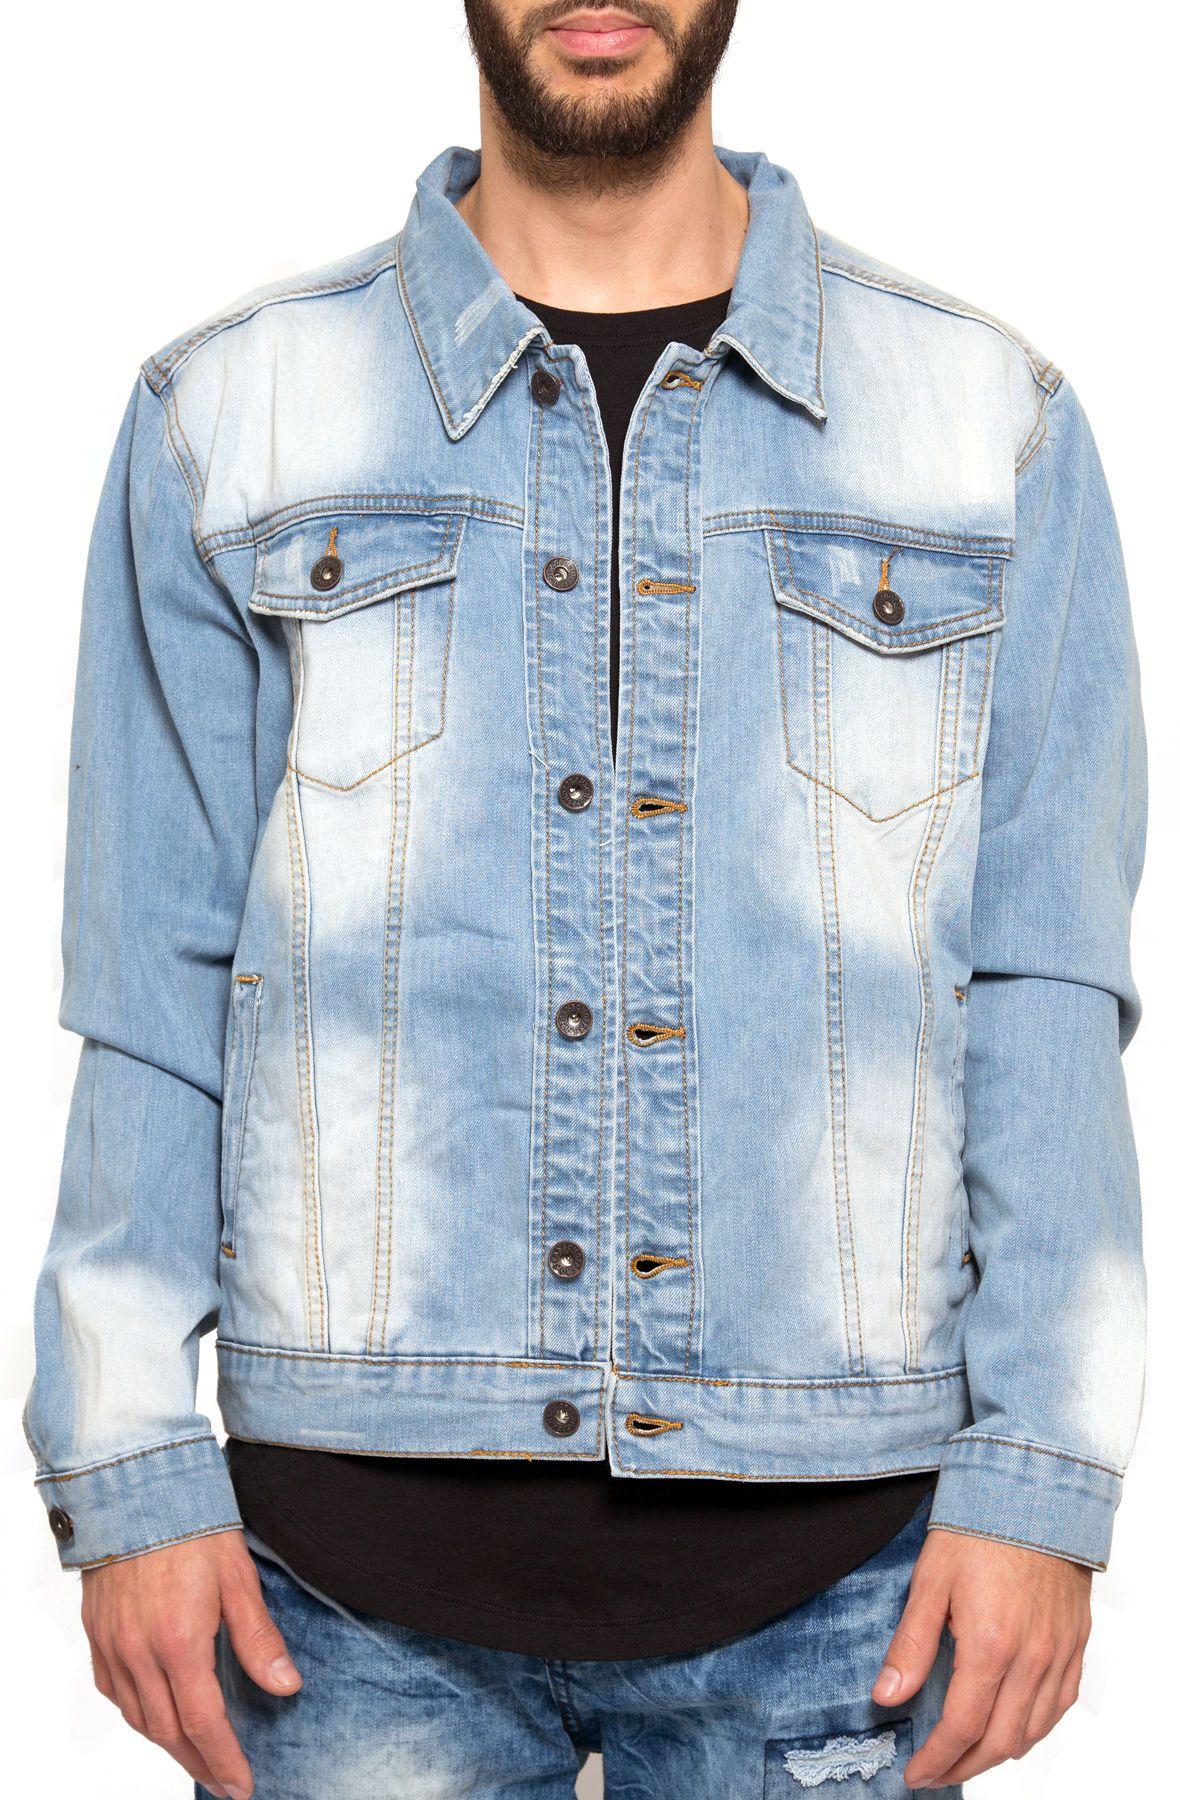 Washed Denim Jacket In 2021 Denim Fashion Denim Jacket Denim Jacket Men [ 1800 x 1180 Pixel ]